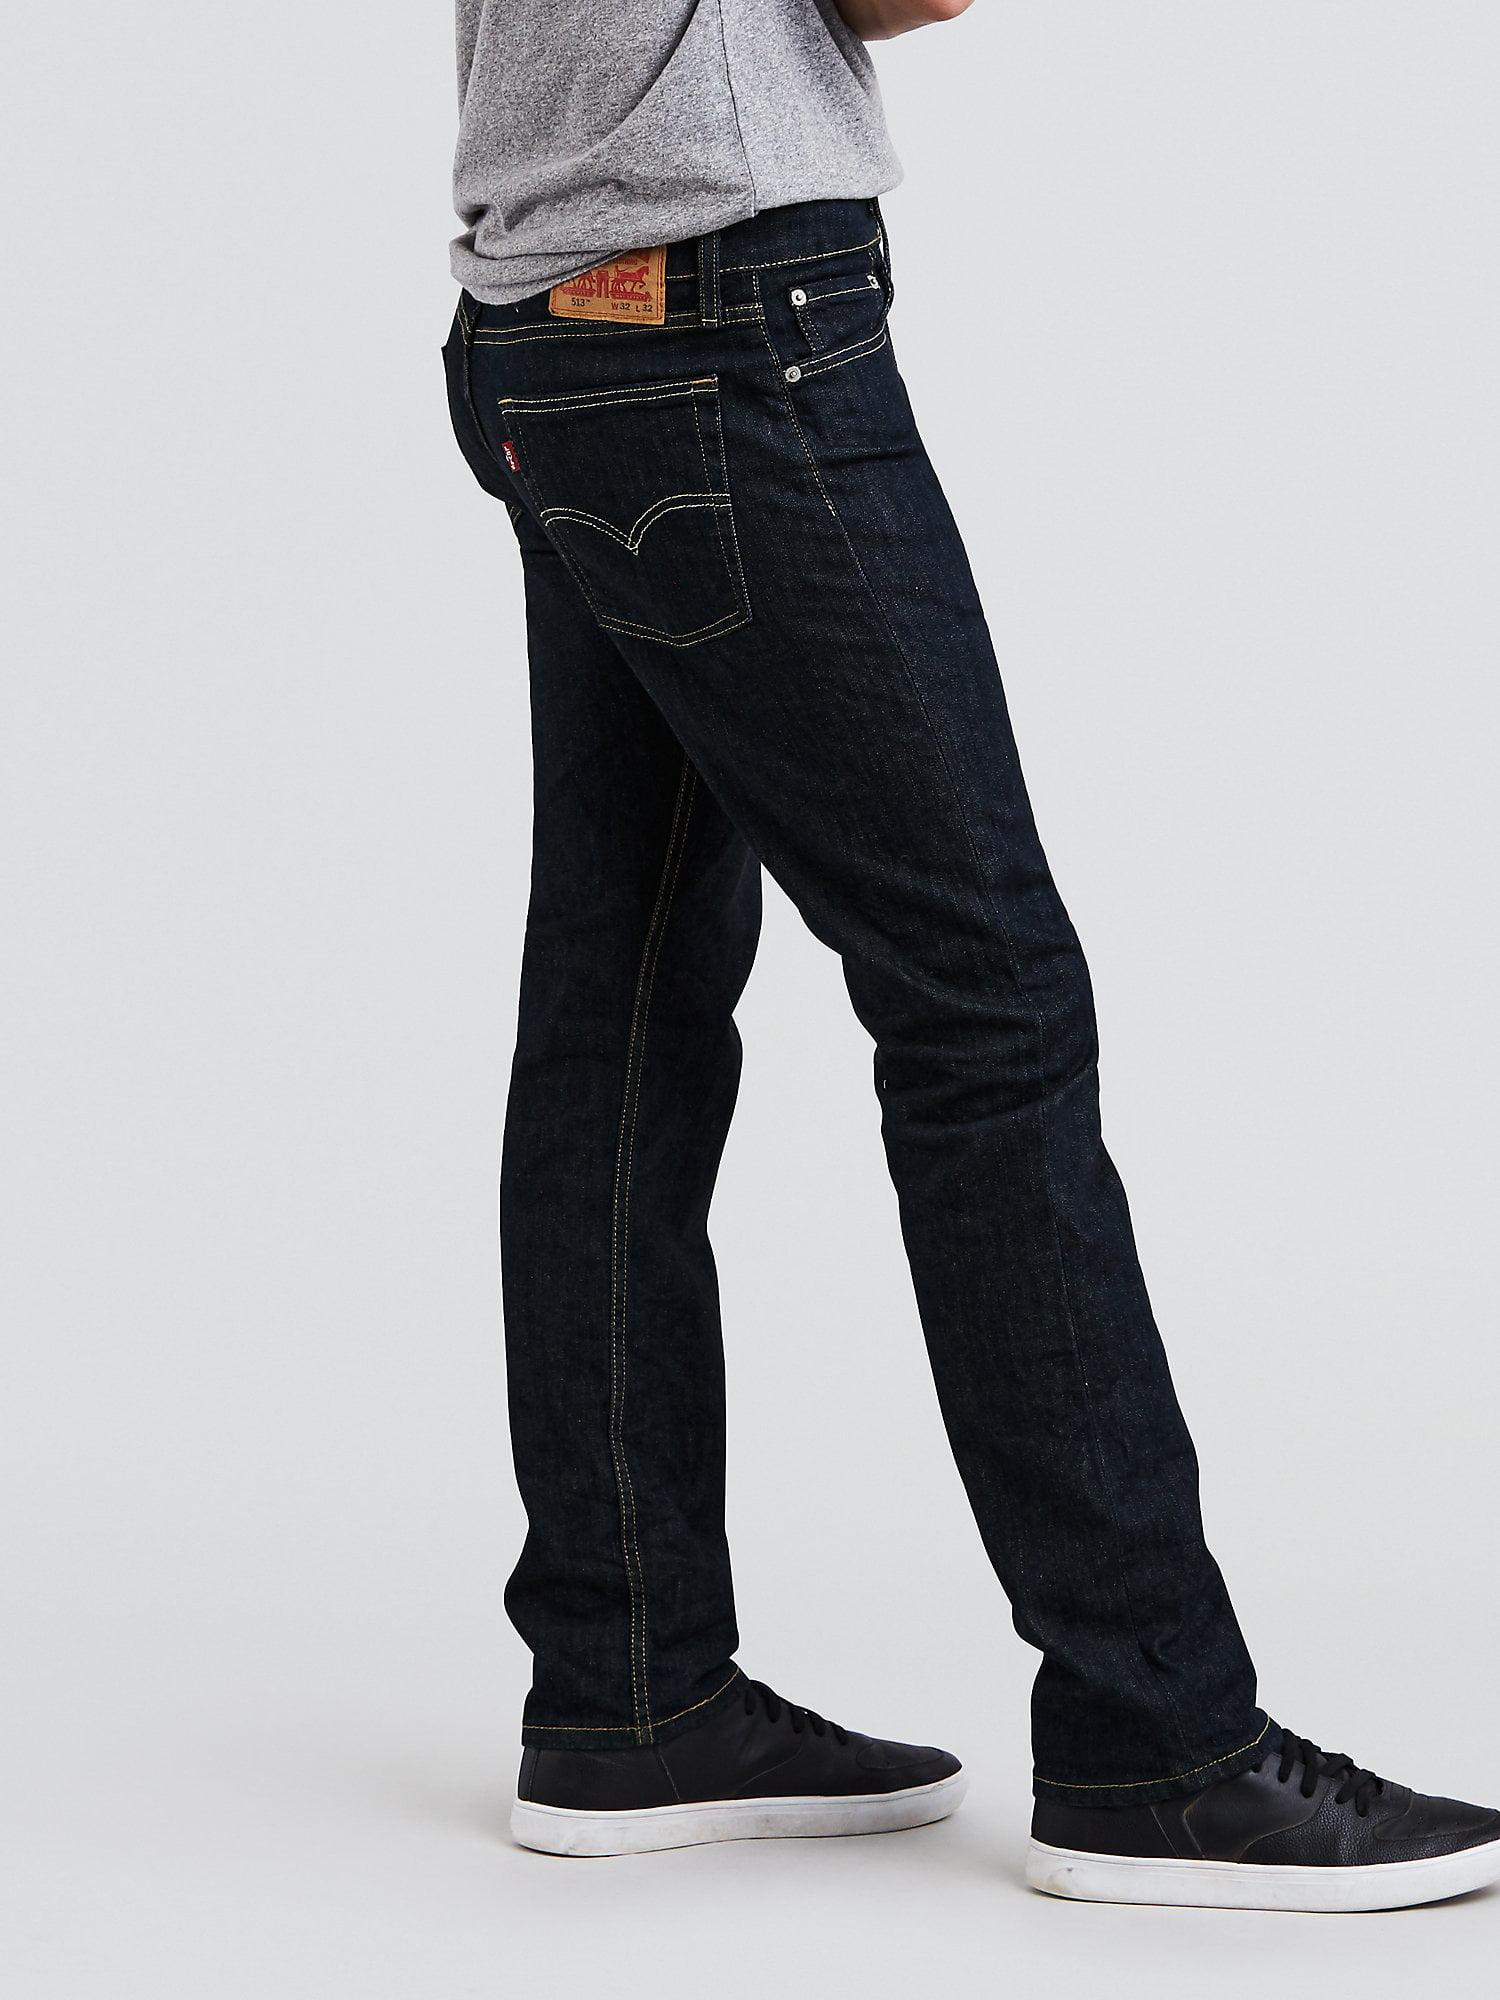 0b8a313e2a0 Levi's - Levi's Men's 513 Slim Straight Jeans - Walmart.com